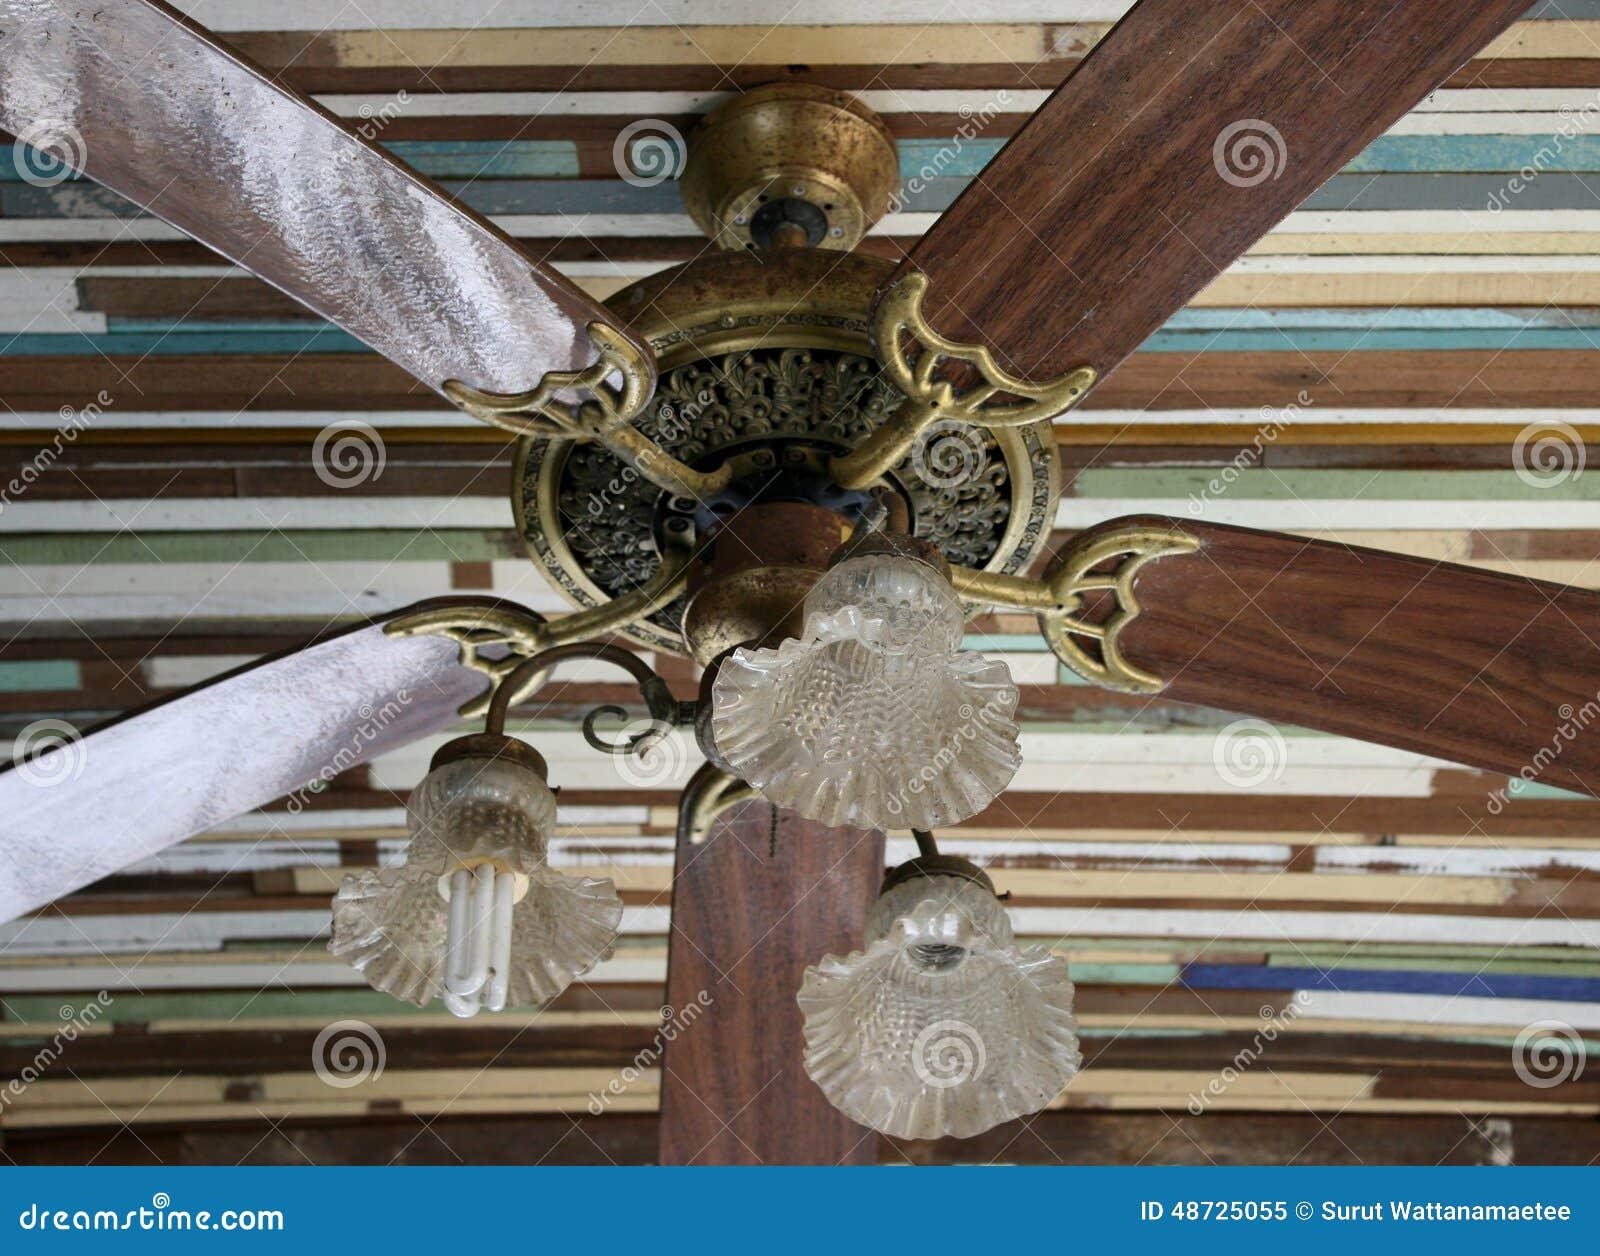 ventilateur de plafond en bois image stock image du. Black Bedroom Furniture Sets. Home Design Ideas